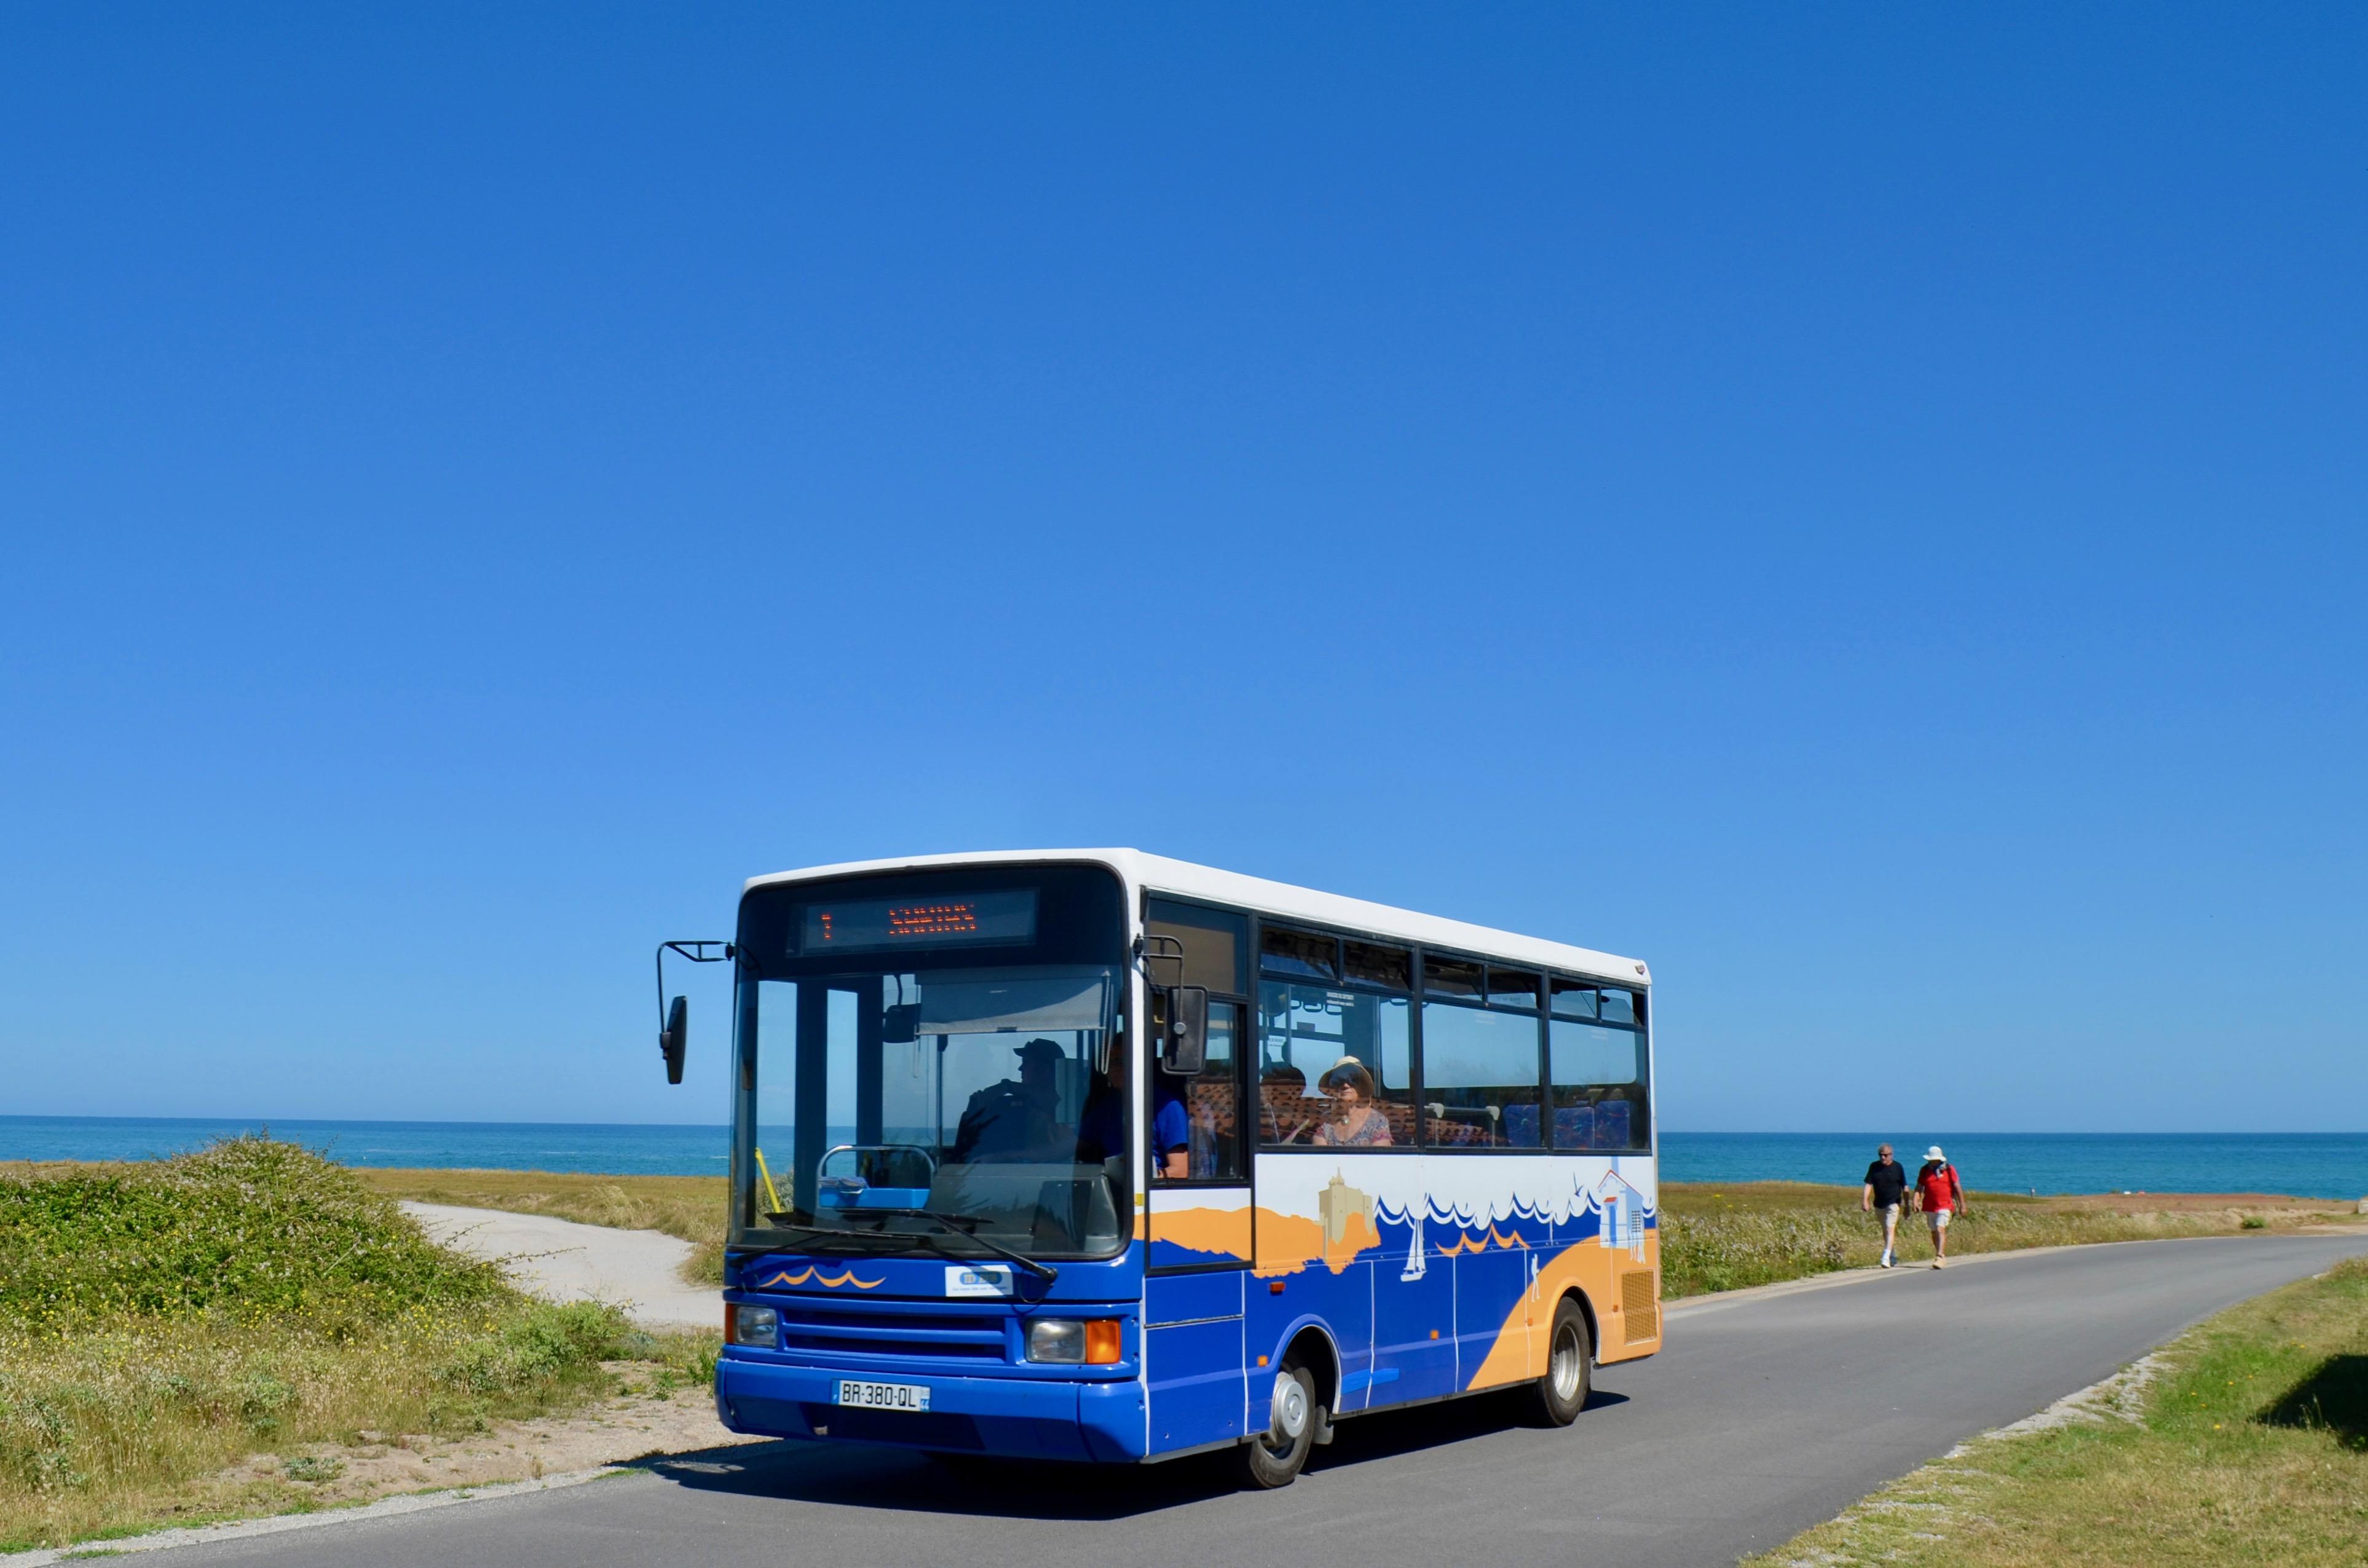 Transports En Commun De L Ile D Yeu Wikipedia